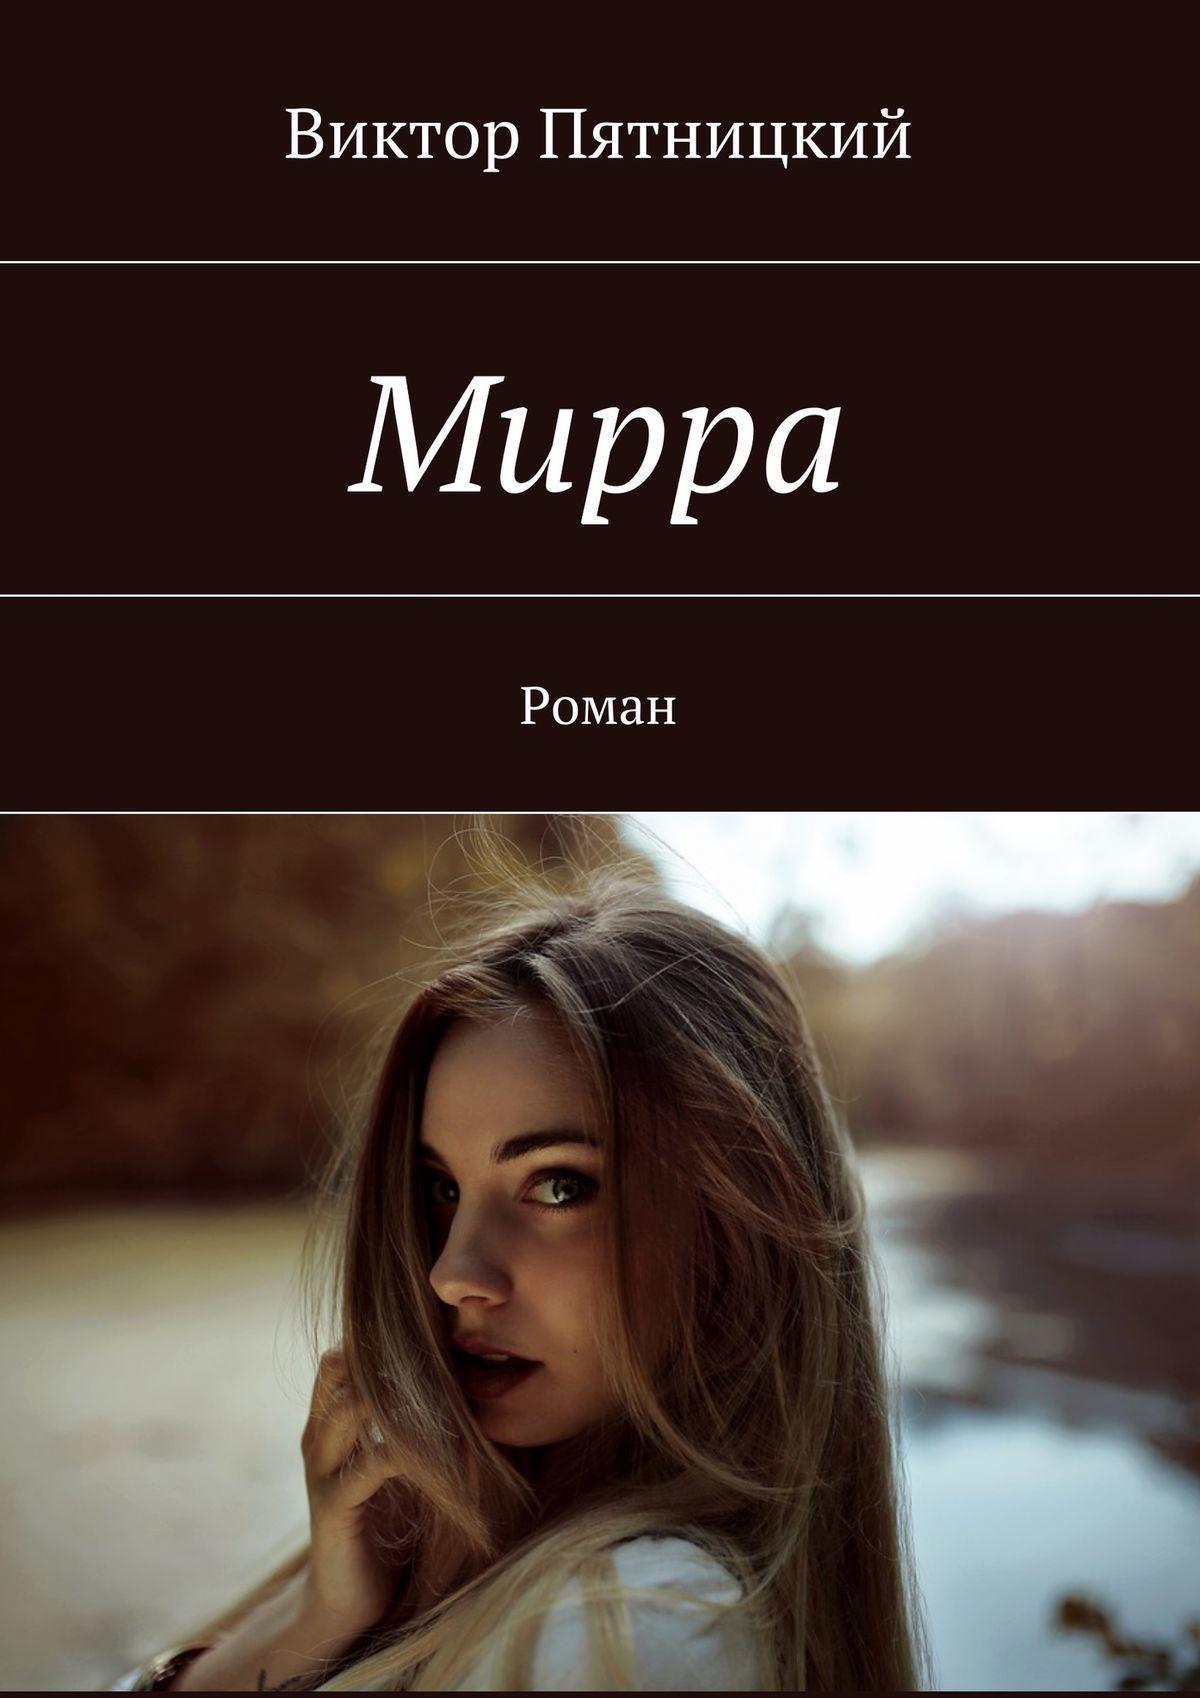 Виктор Пятницкий - Мирра. Роман